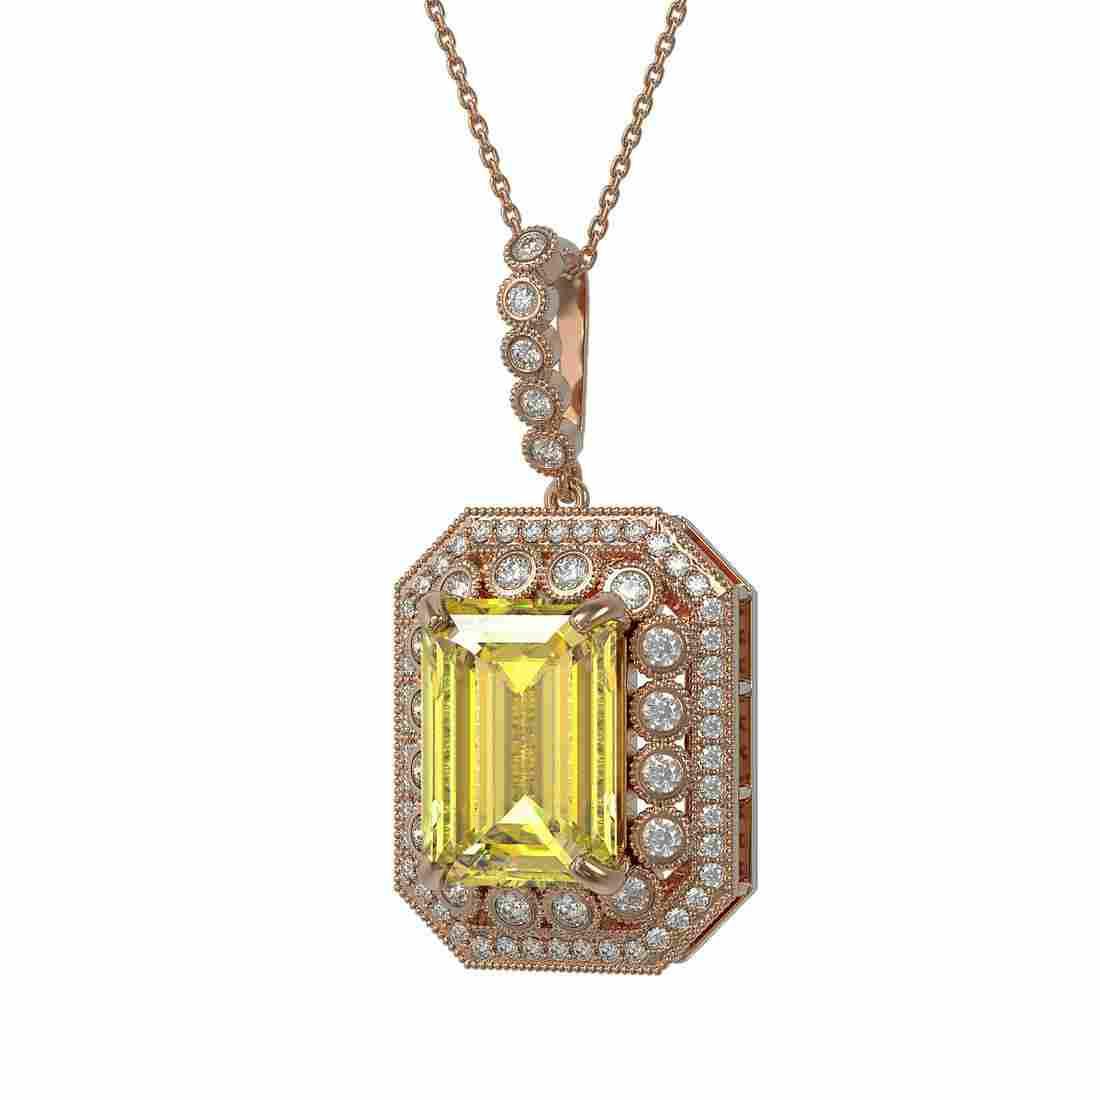 16.65 ctw Canary Citrine & Diamond Victorian Necklace